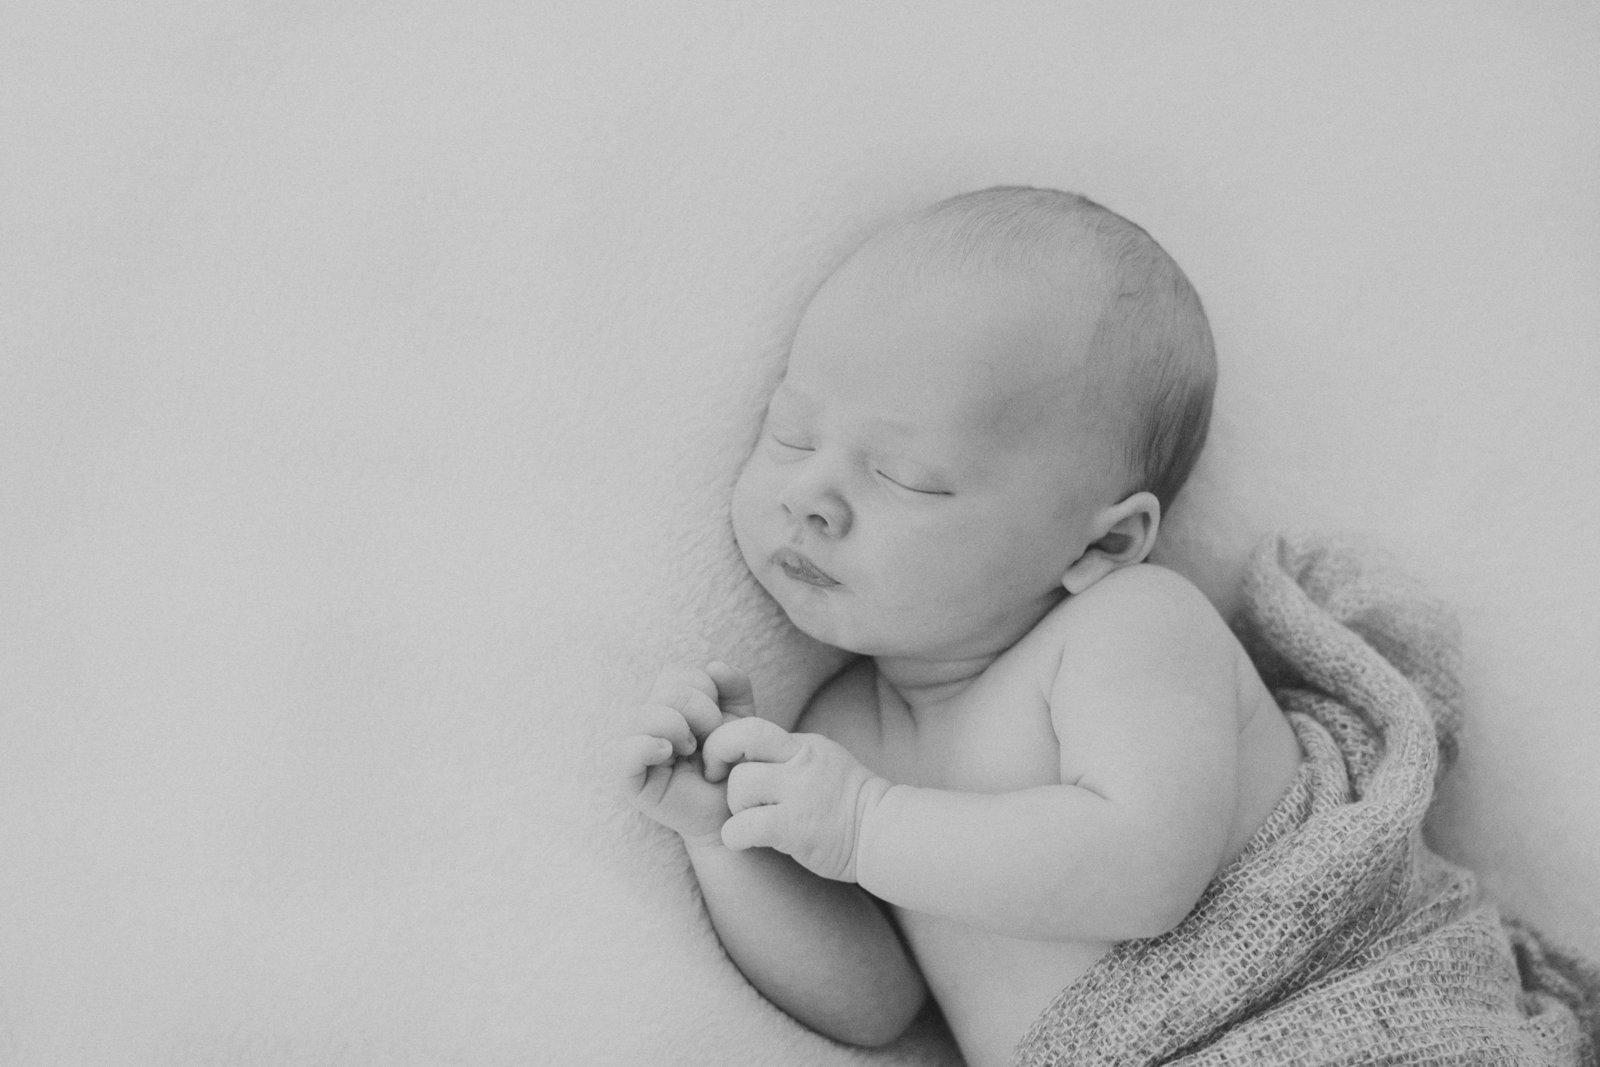 Babyfotos, Babybilder, Babyfotograf, Neugeborenenfotos, Neugeborenenbilder